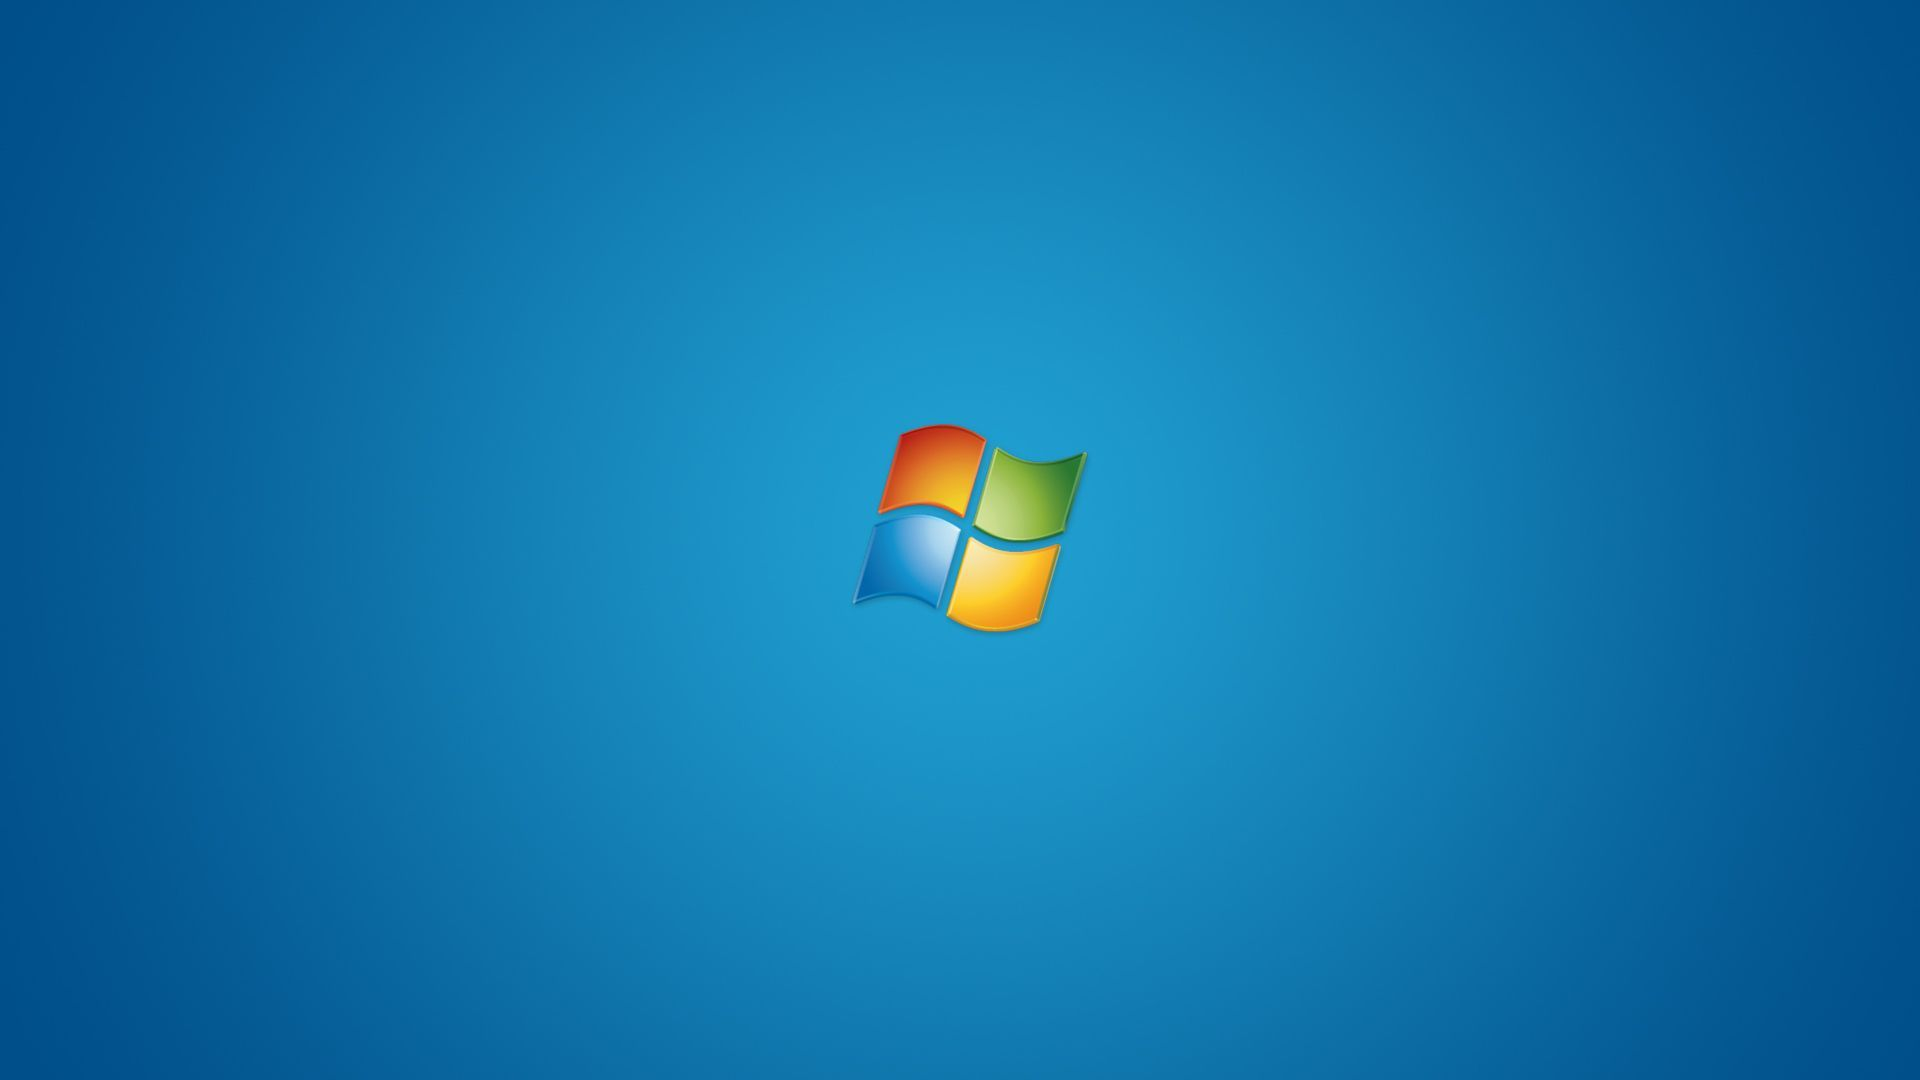 windows ultimate wallpapers hd wallpaper | hd wallpapers | pinterest